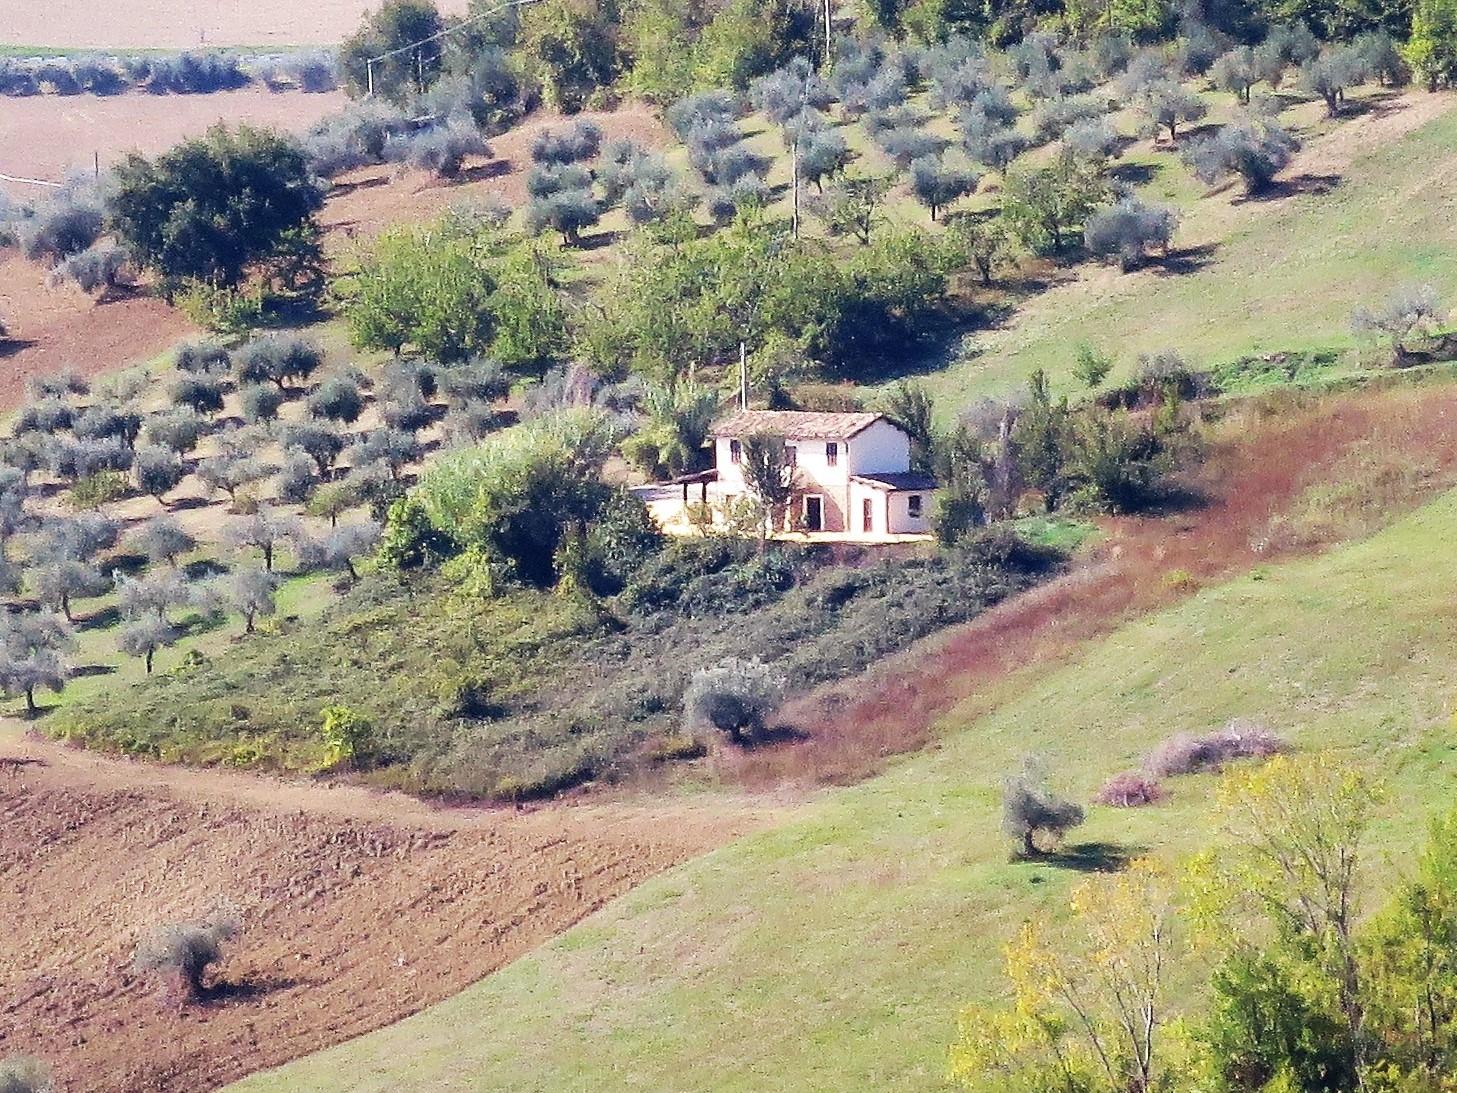 Country Houses Country Houses for sale Montefino (TE), Casa Collina - Montefino - EUR 151.447 430